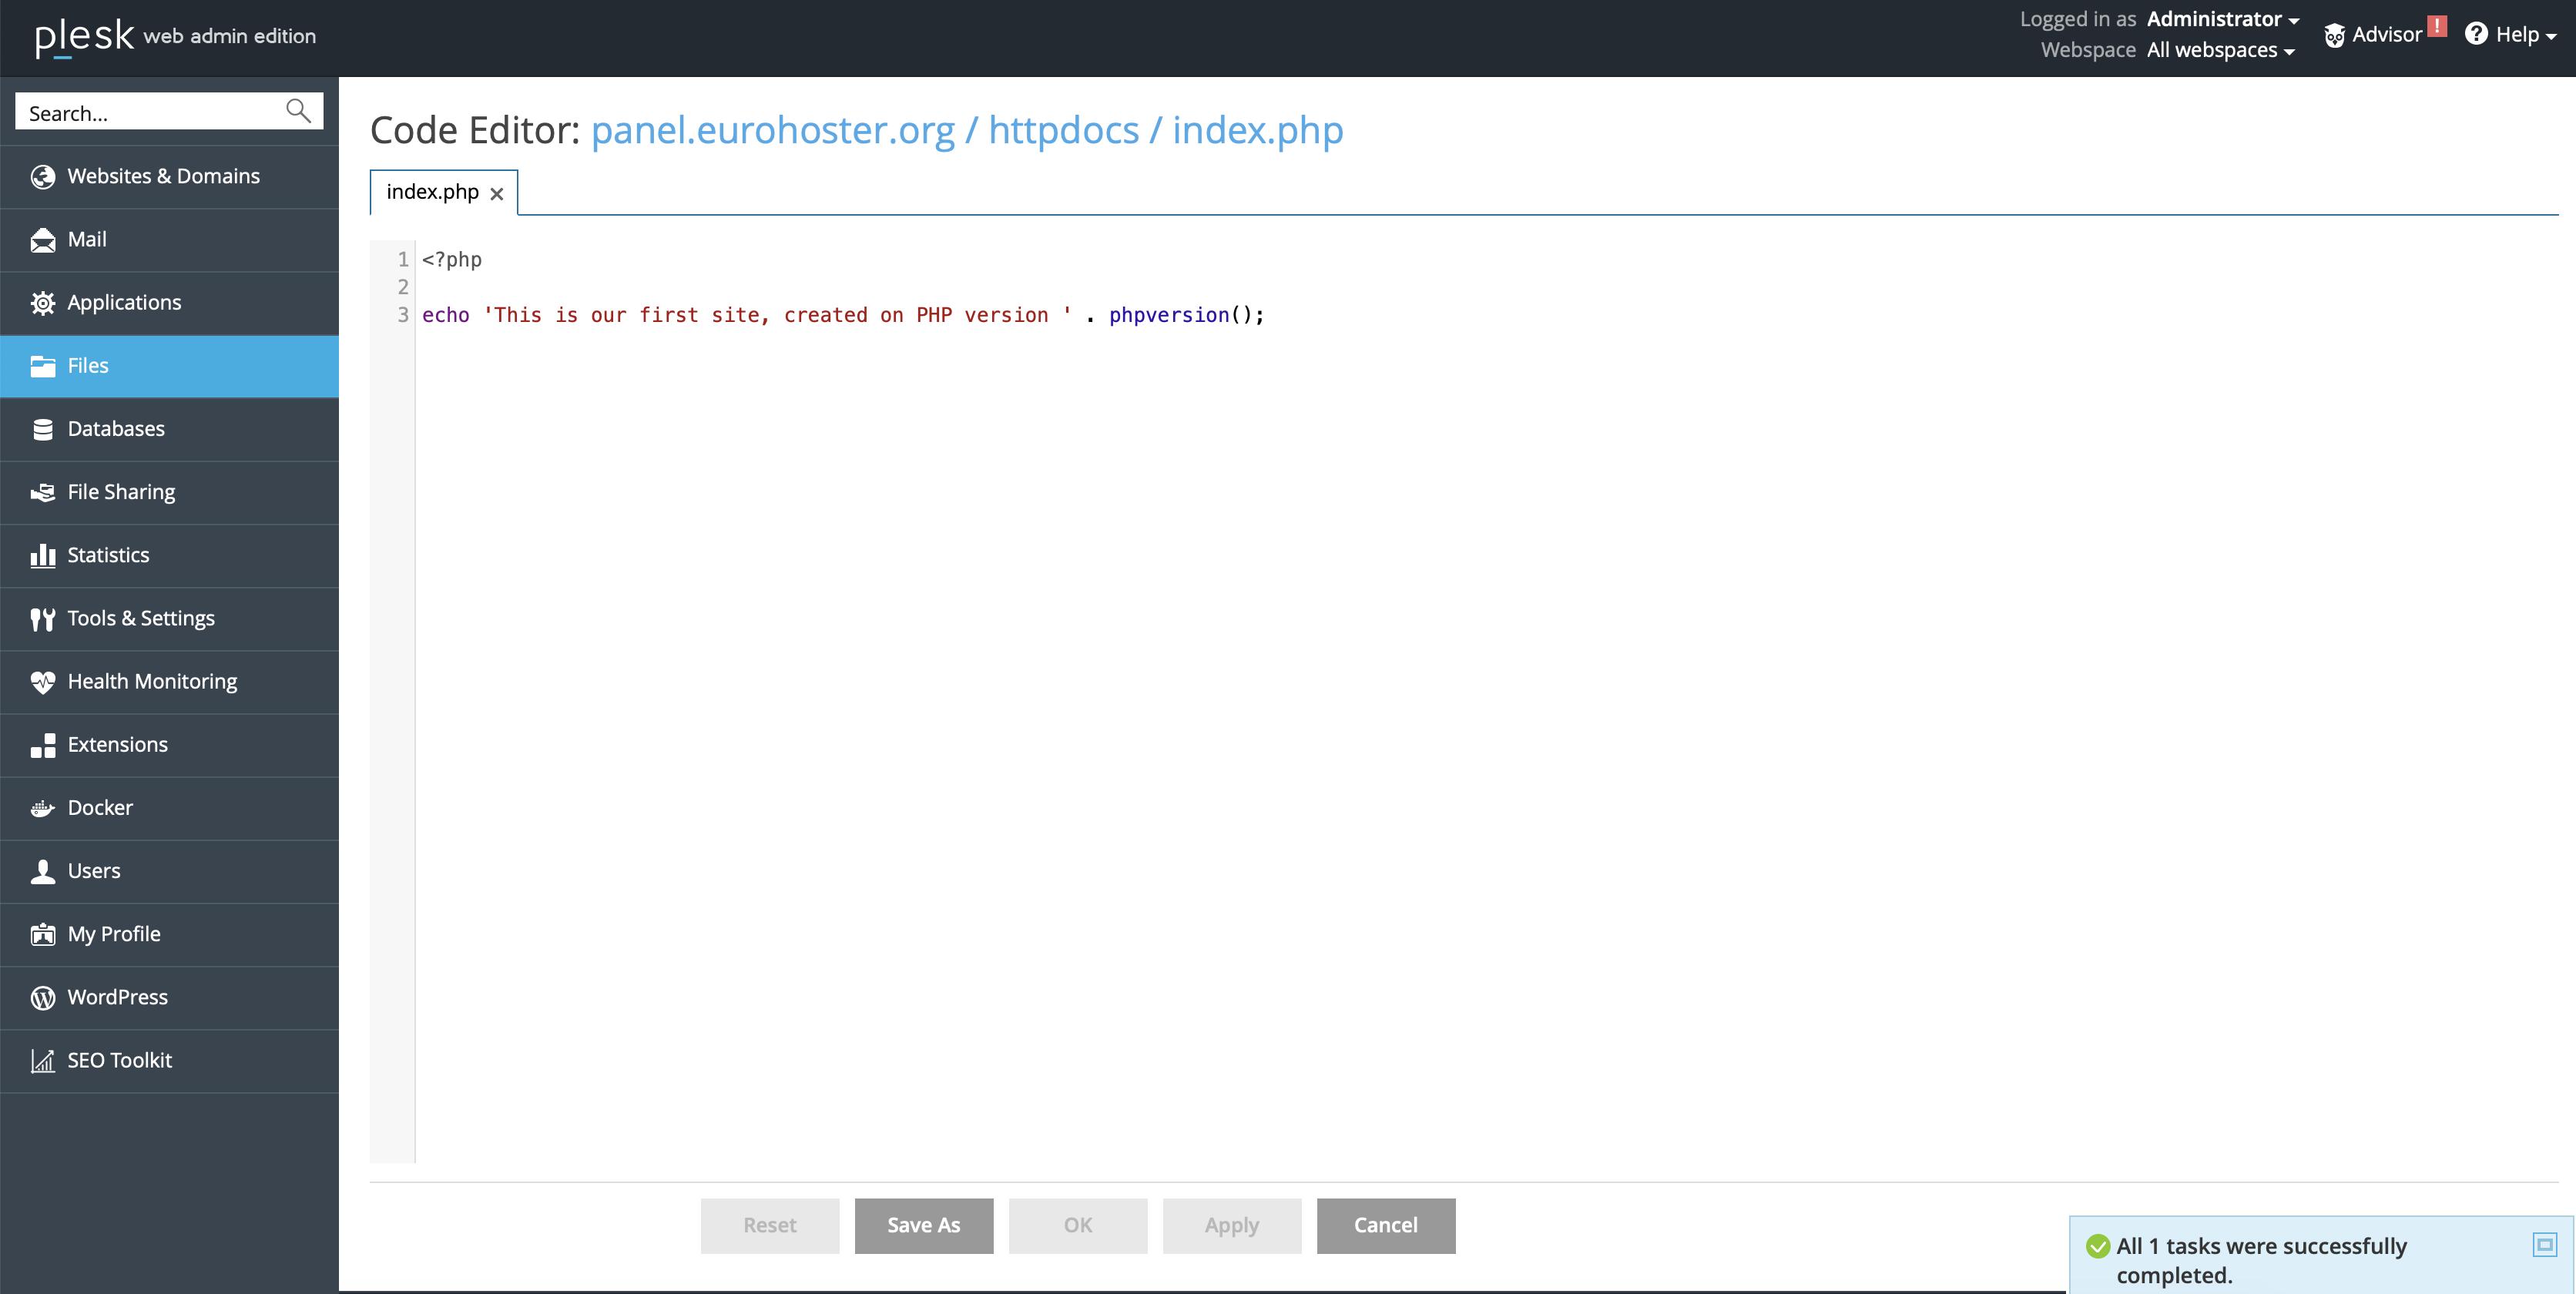 Plesk Code Editor